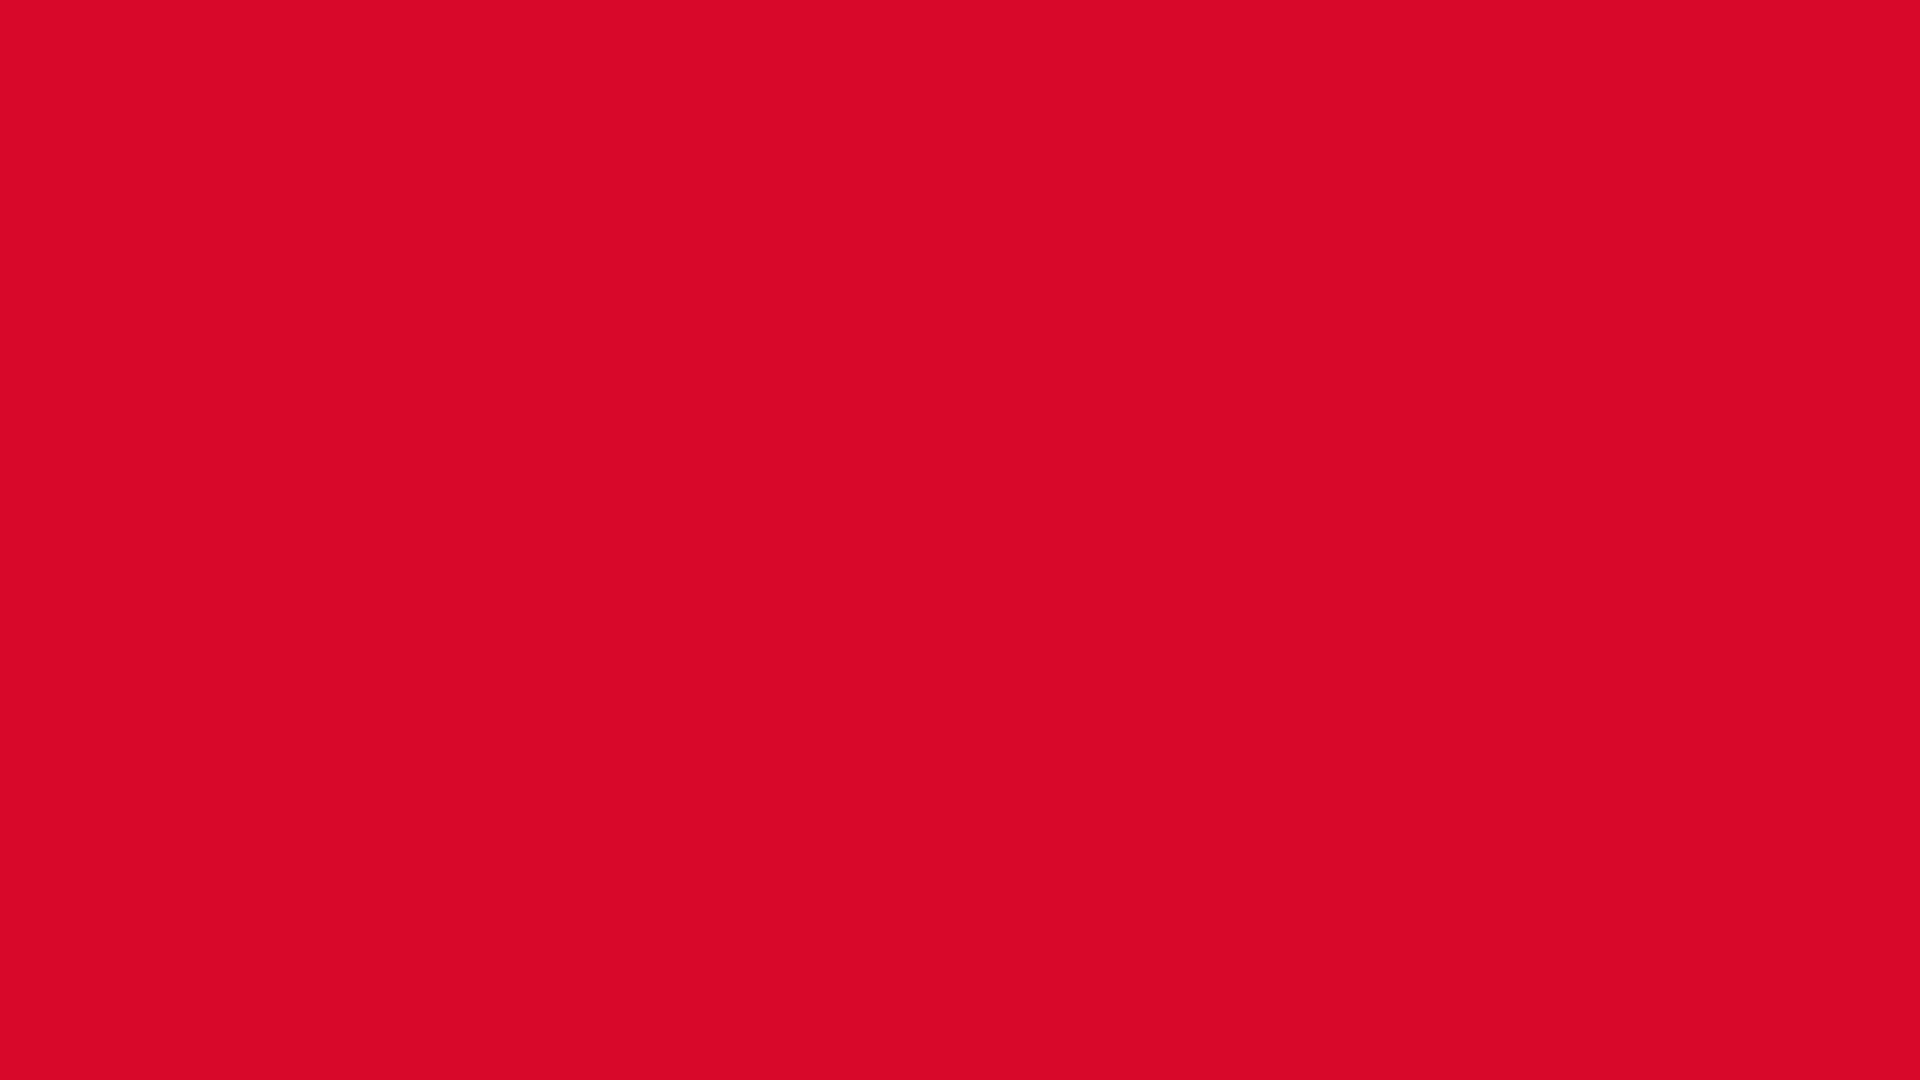 header mglingua rot versicherung